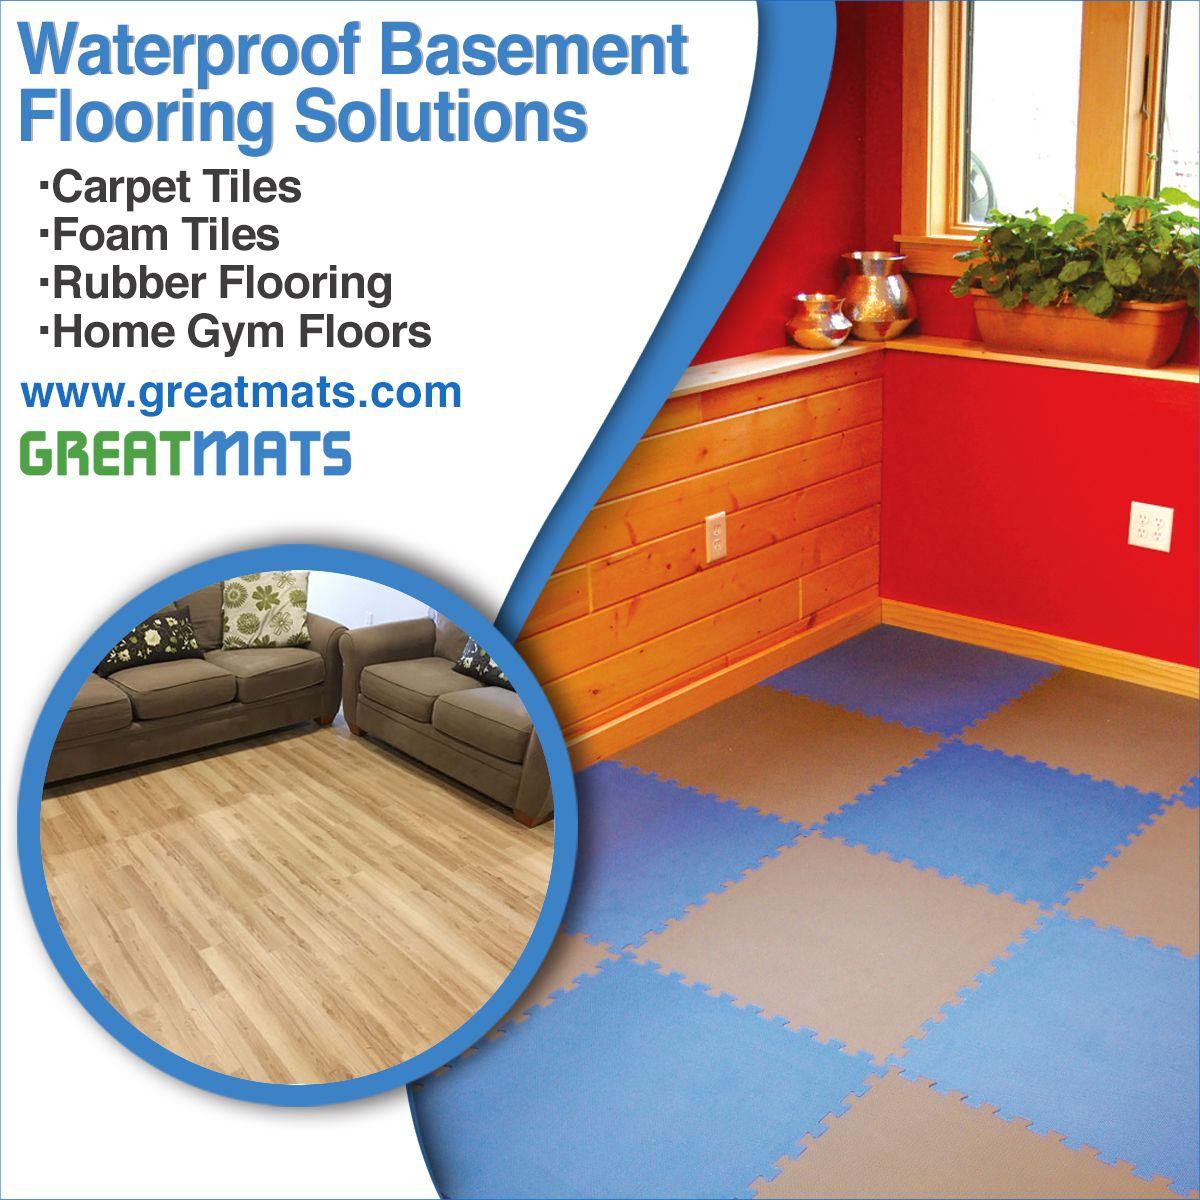 Waterproof Basement Flooring Solutions In 2020 Basement Flooring Waterproof Basement Flooring Waterproofing Basement